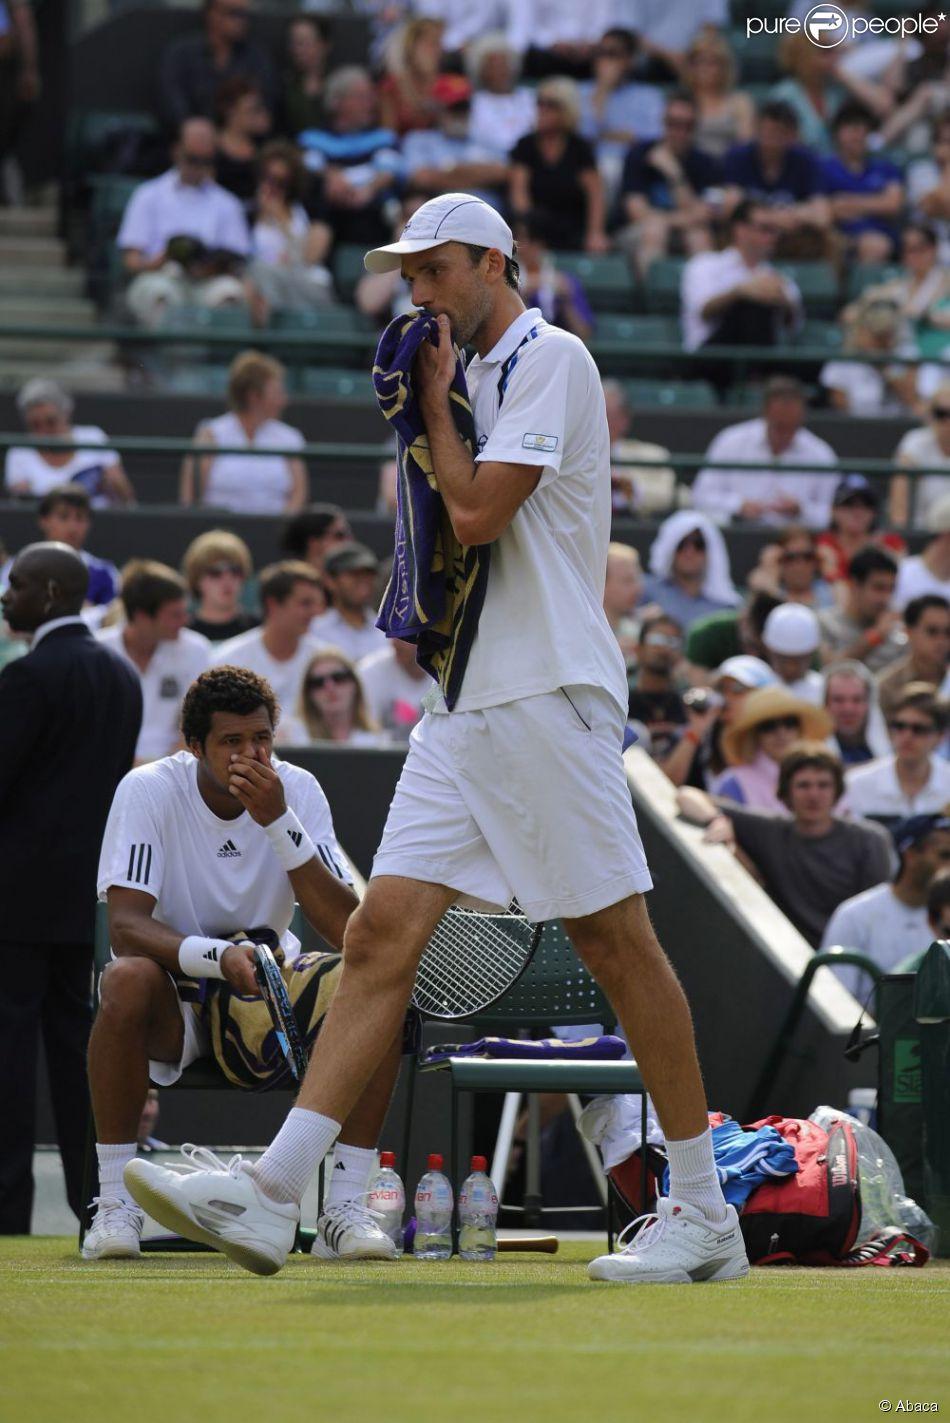 Ivo Karlovic durant son match face à Jo-Wilfried Tsonga à Wimbledon le 26 juin 2009